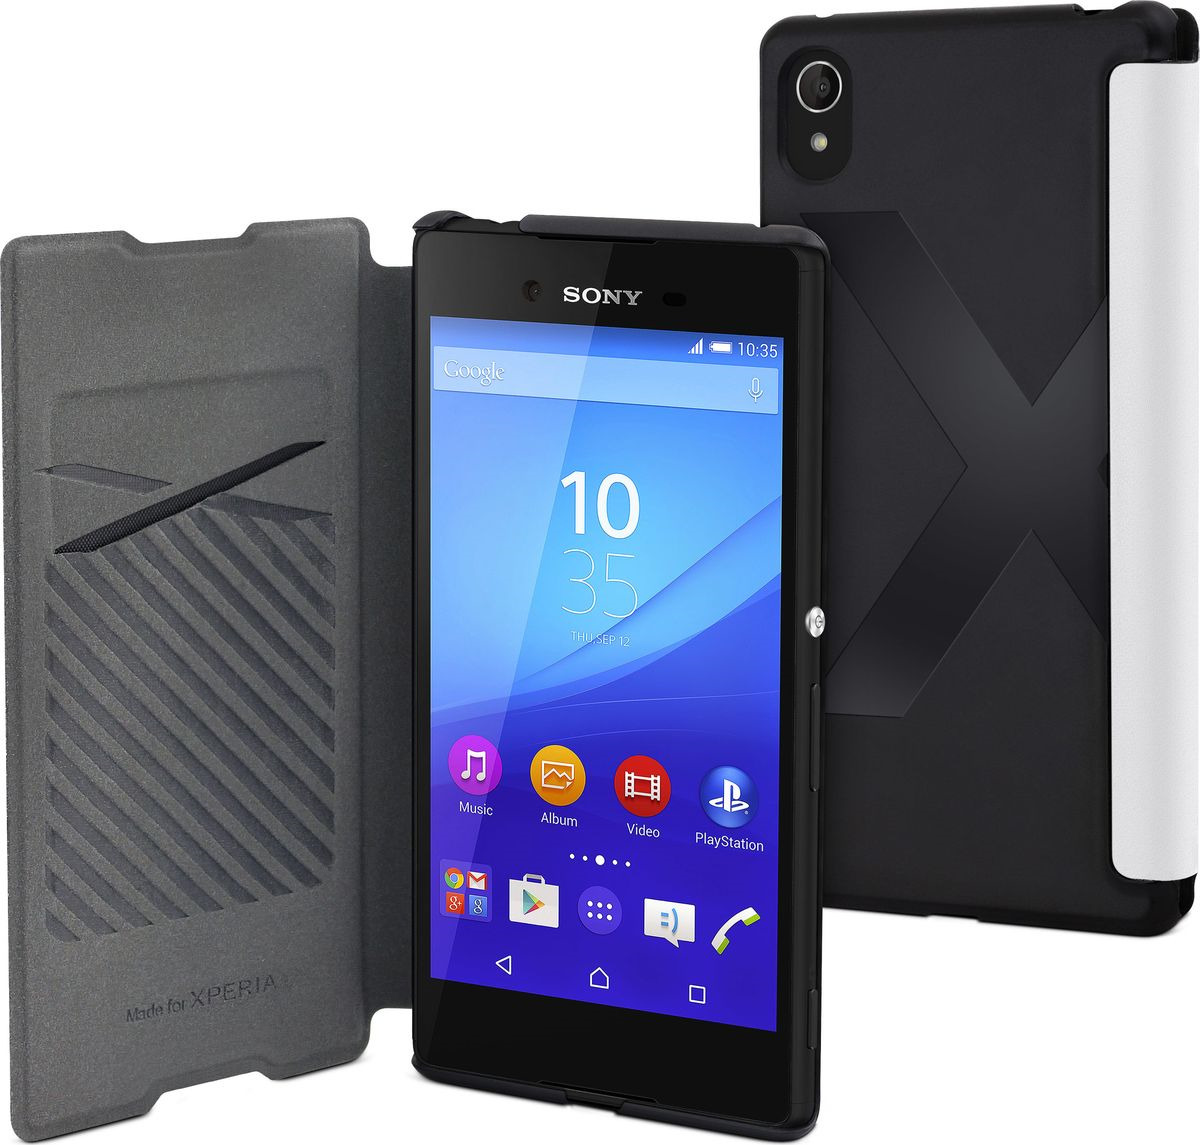 Чехол для сотового телефона Muvit MFX Easy Folio Case для Sony Xperia Z3+, SEEAF0032, белый